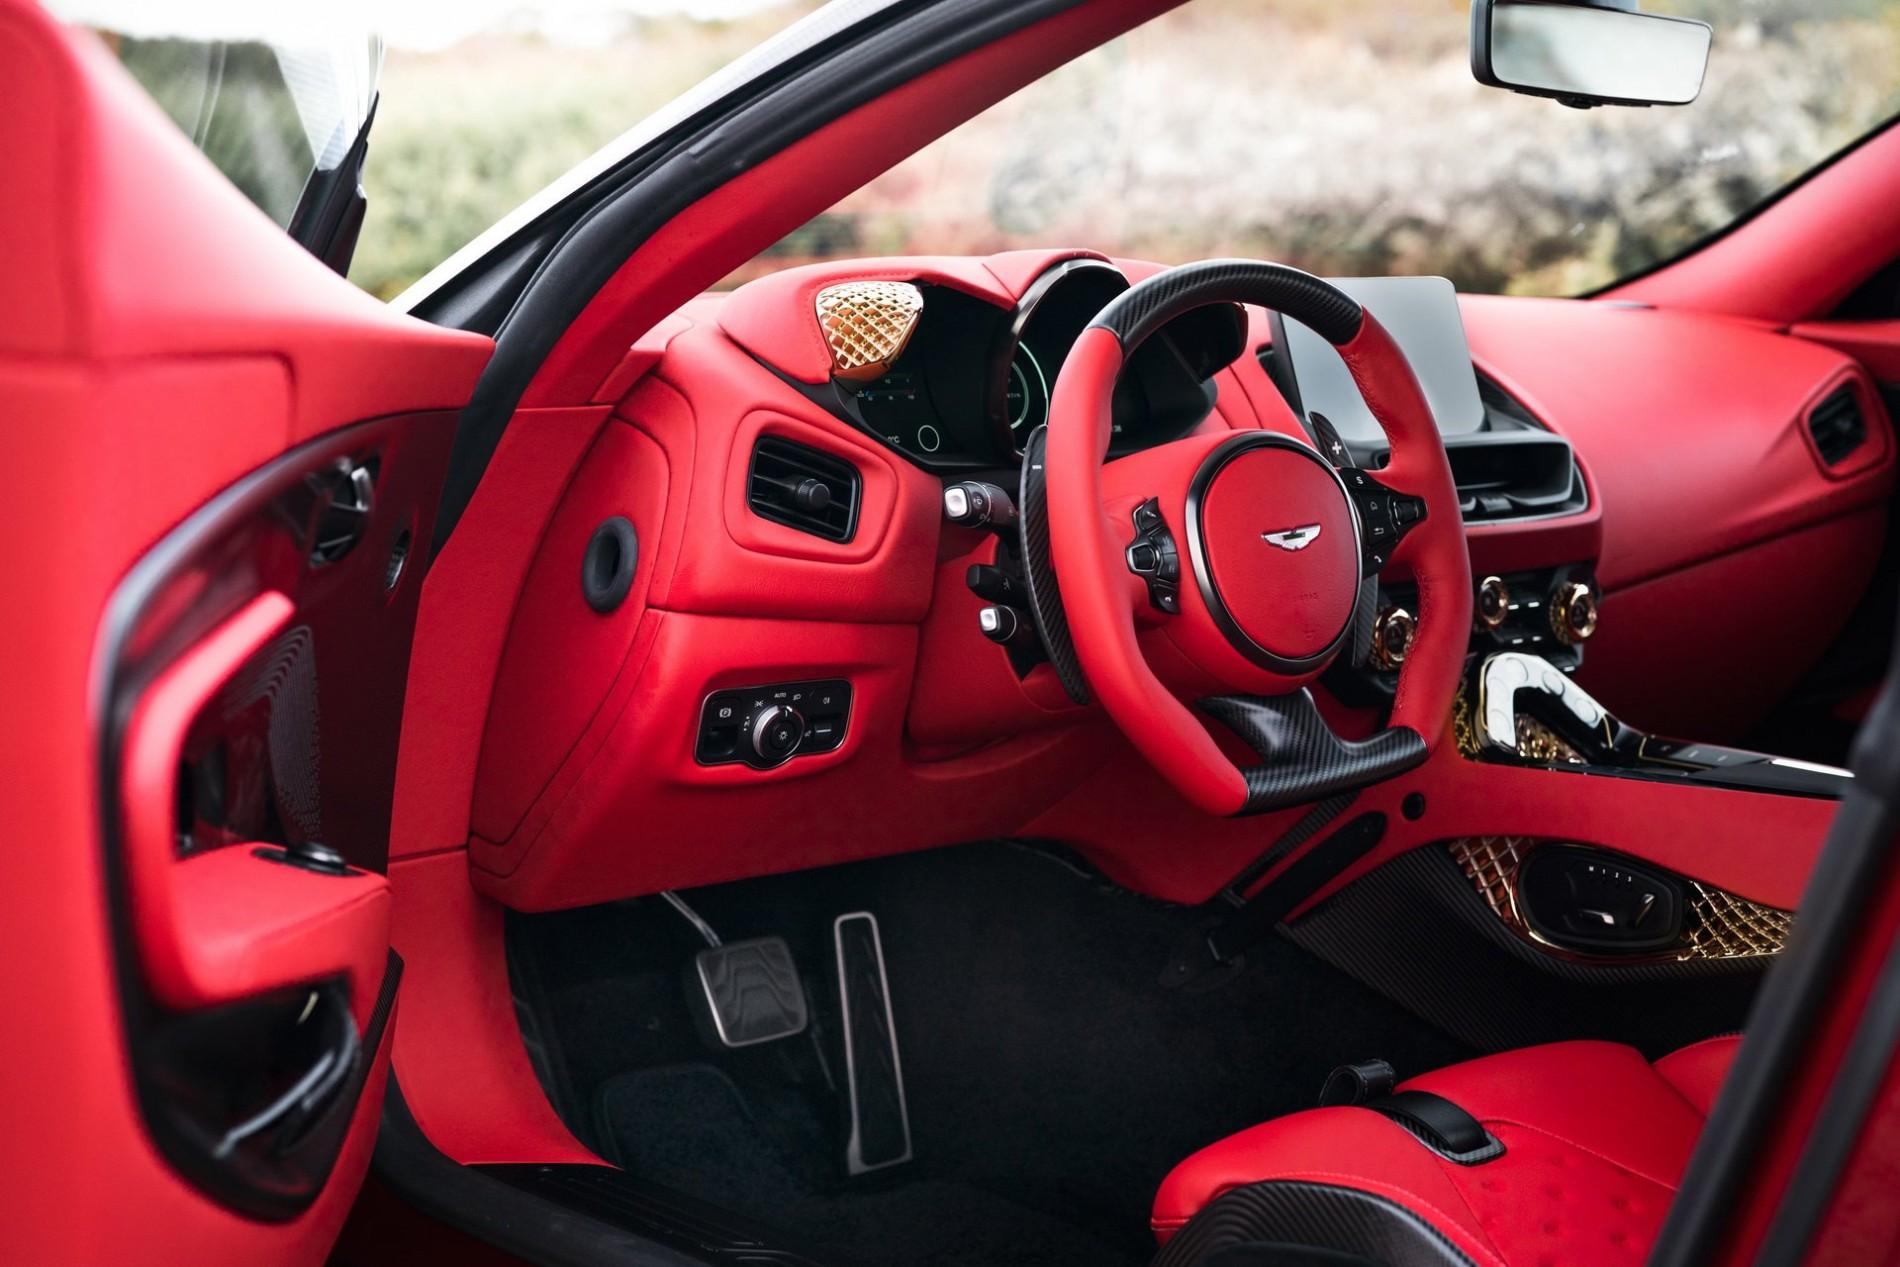 Aston Martin DBS GT Zagato - Aston Martin DBS GT Zagato